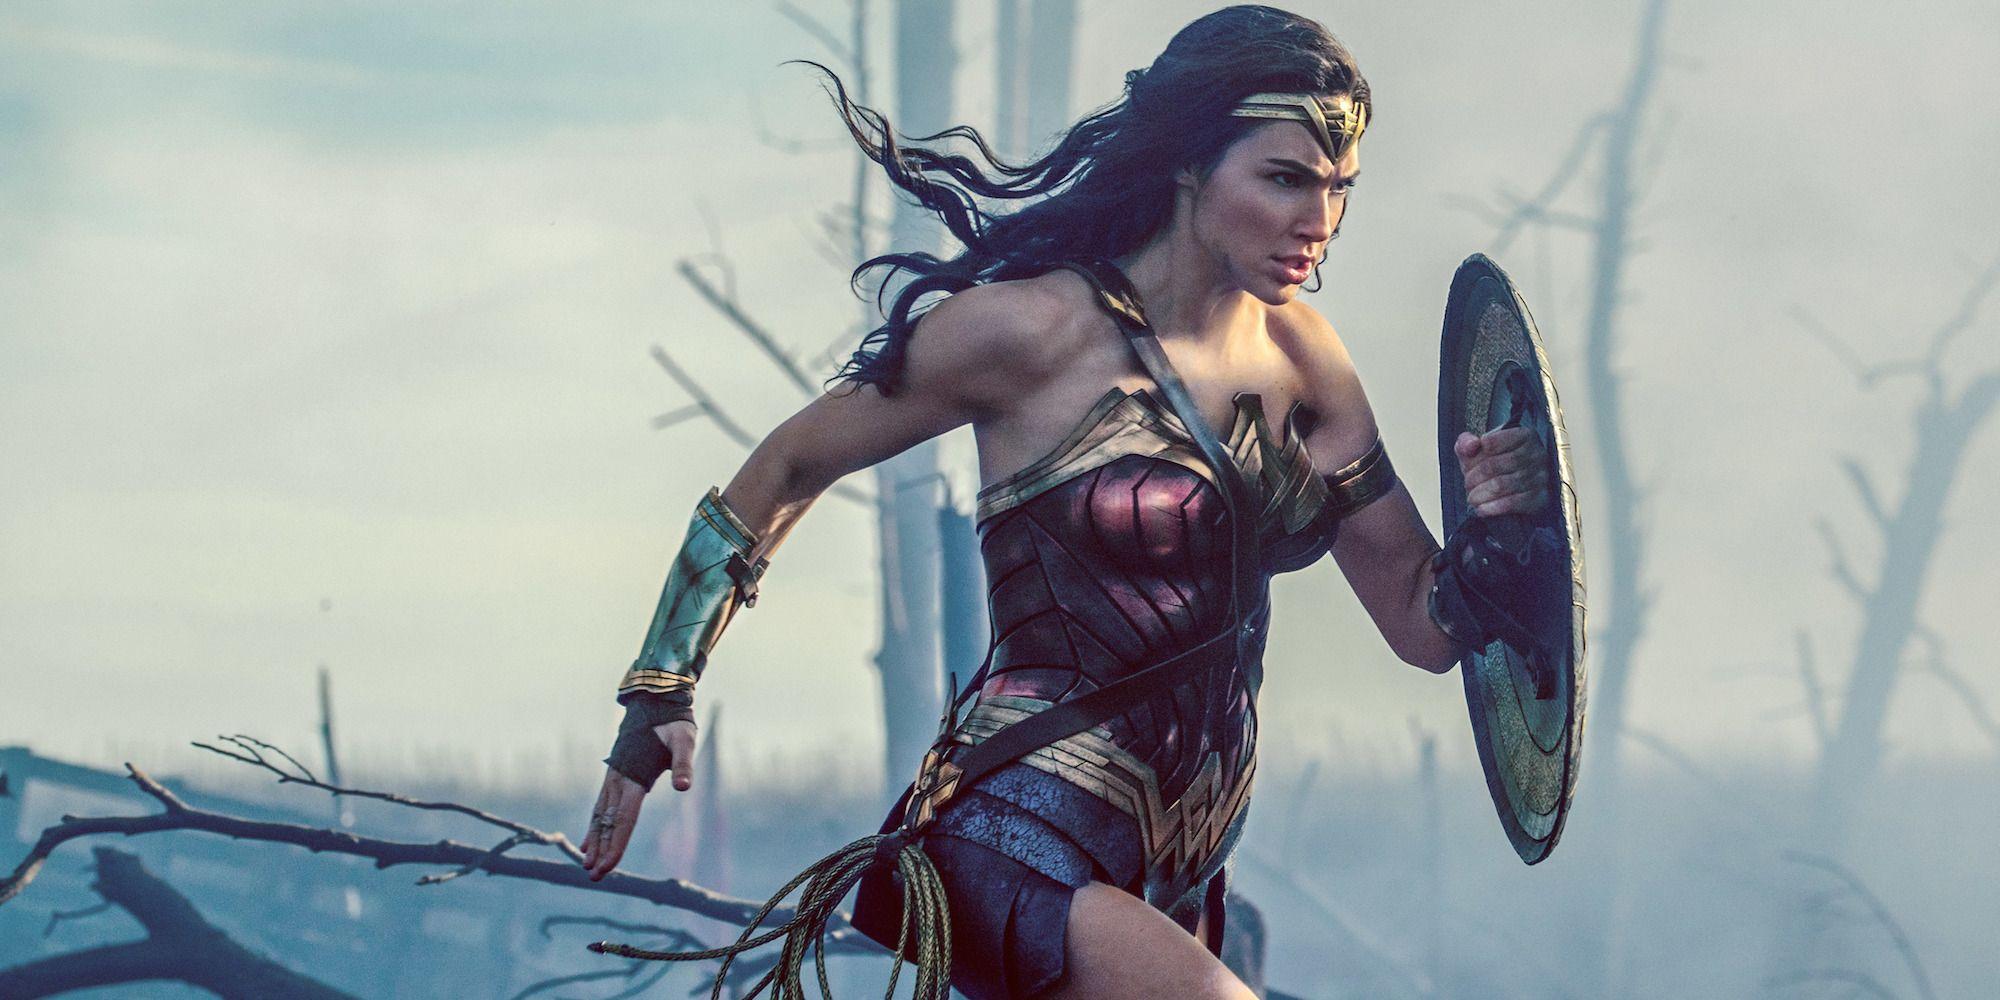 Wonder Woman: No Man's Land Scene Almost Cut | Screen Rant